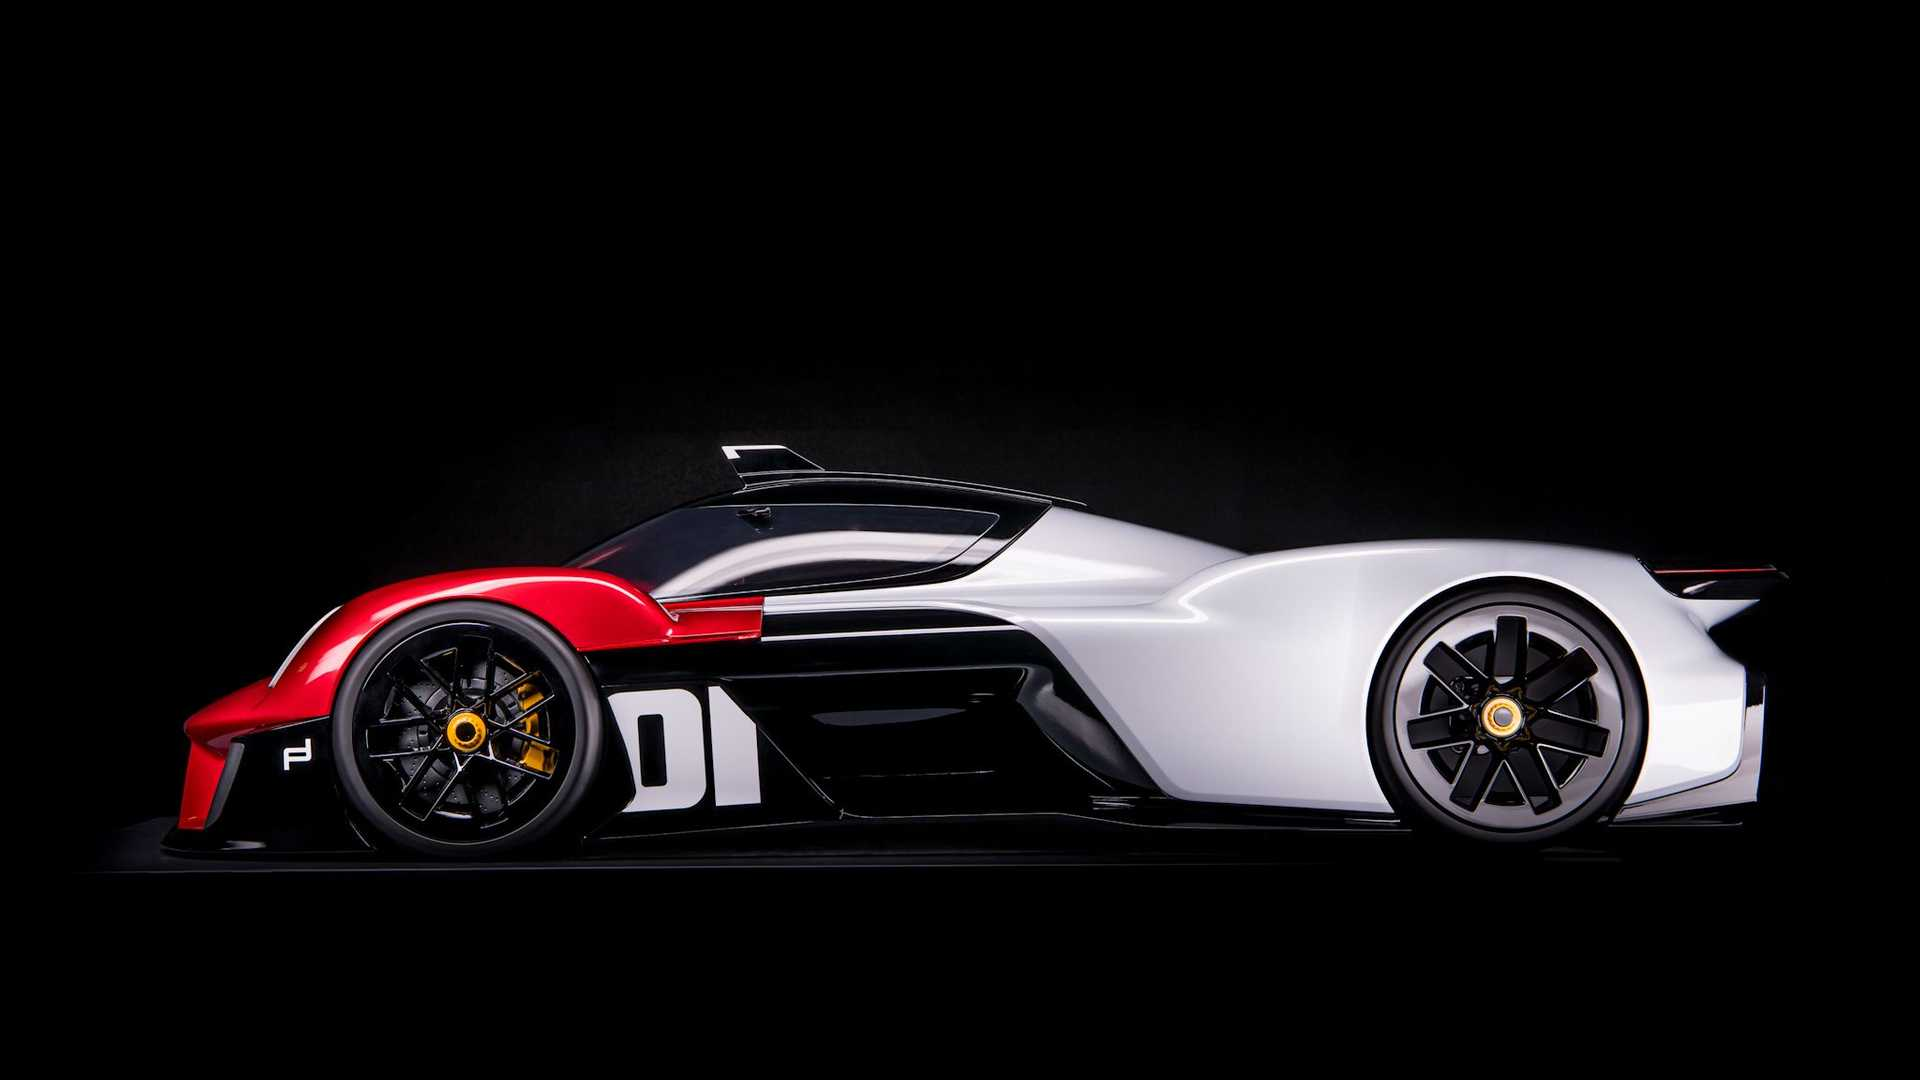 Porsche Vision 920 Is A Le Mans Racer For The Road